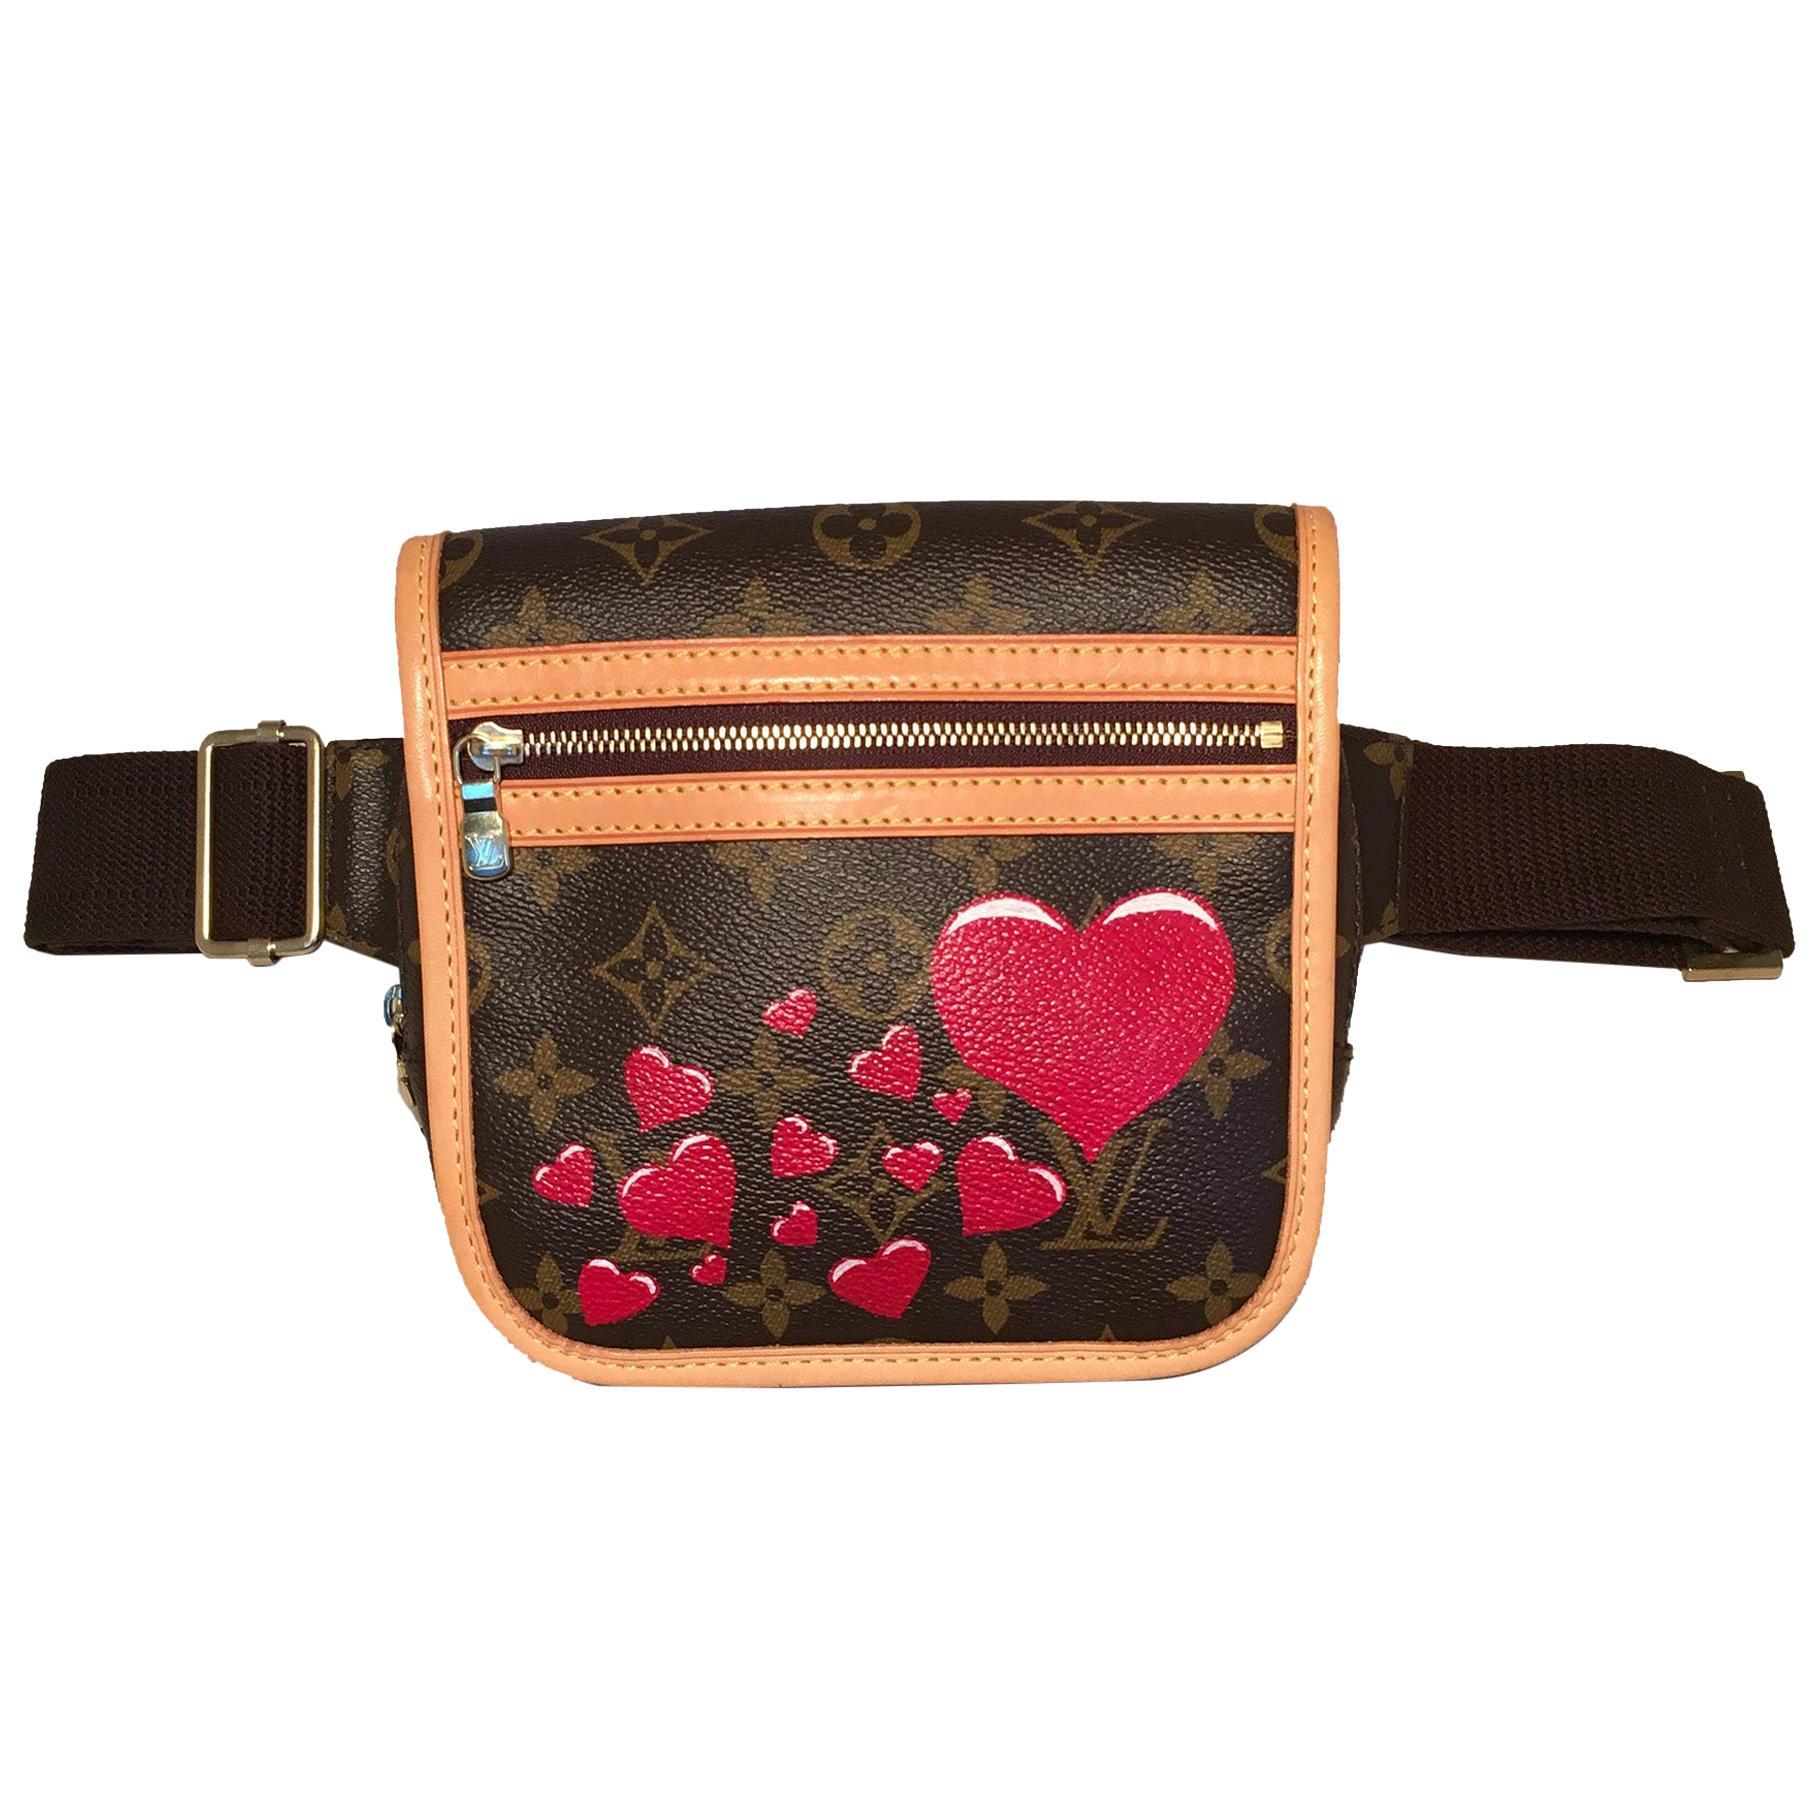 Louis Vuitton Monogram Customized Hearts Bosphore Bum Bag Fanny Pack Belt Bag